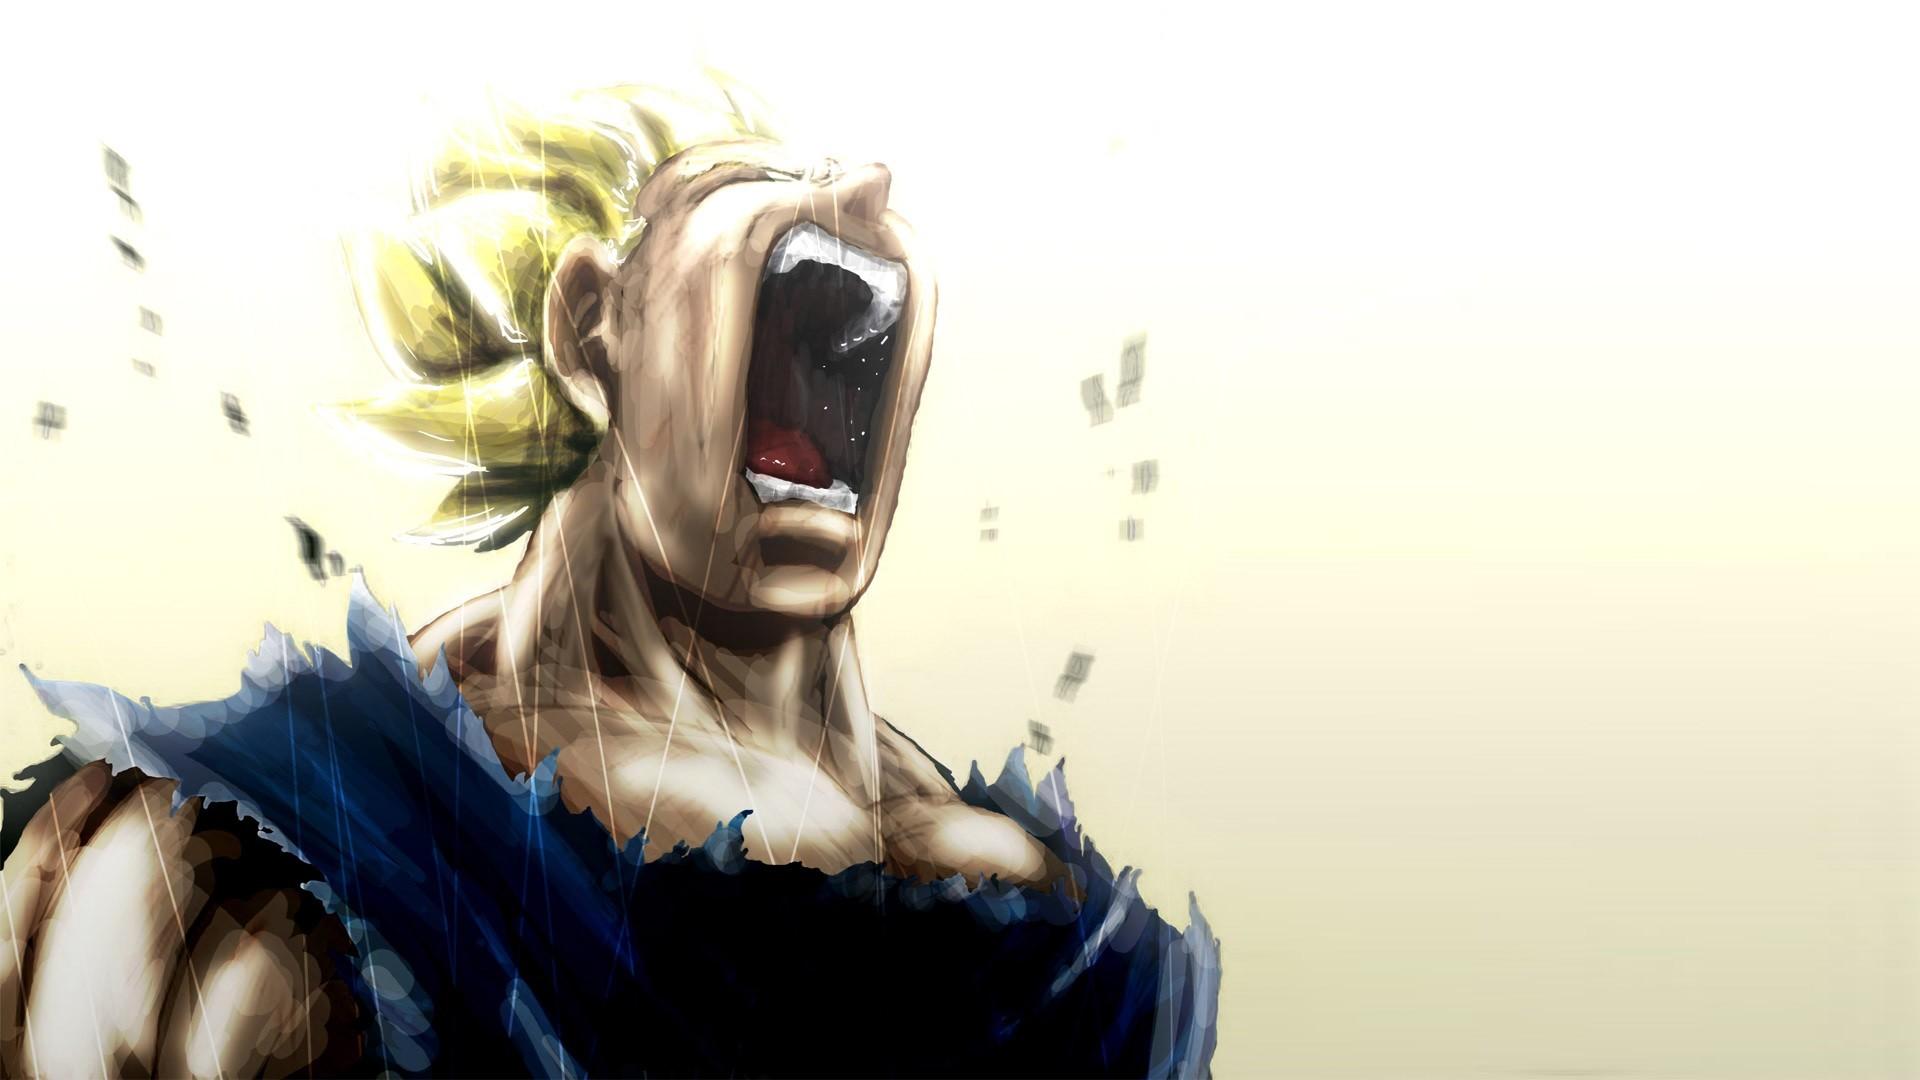 … goku Wallpapers HD 0 HTML code. Vegeta Super Saiyan Cry